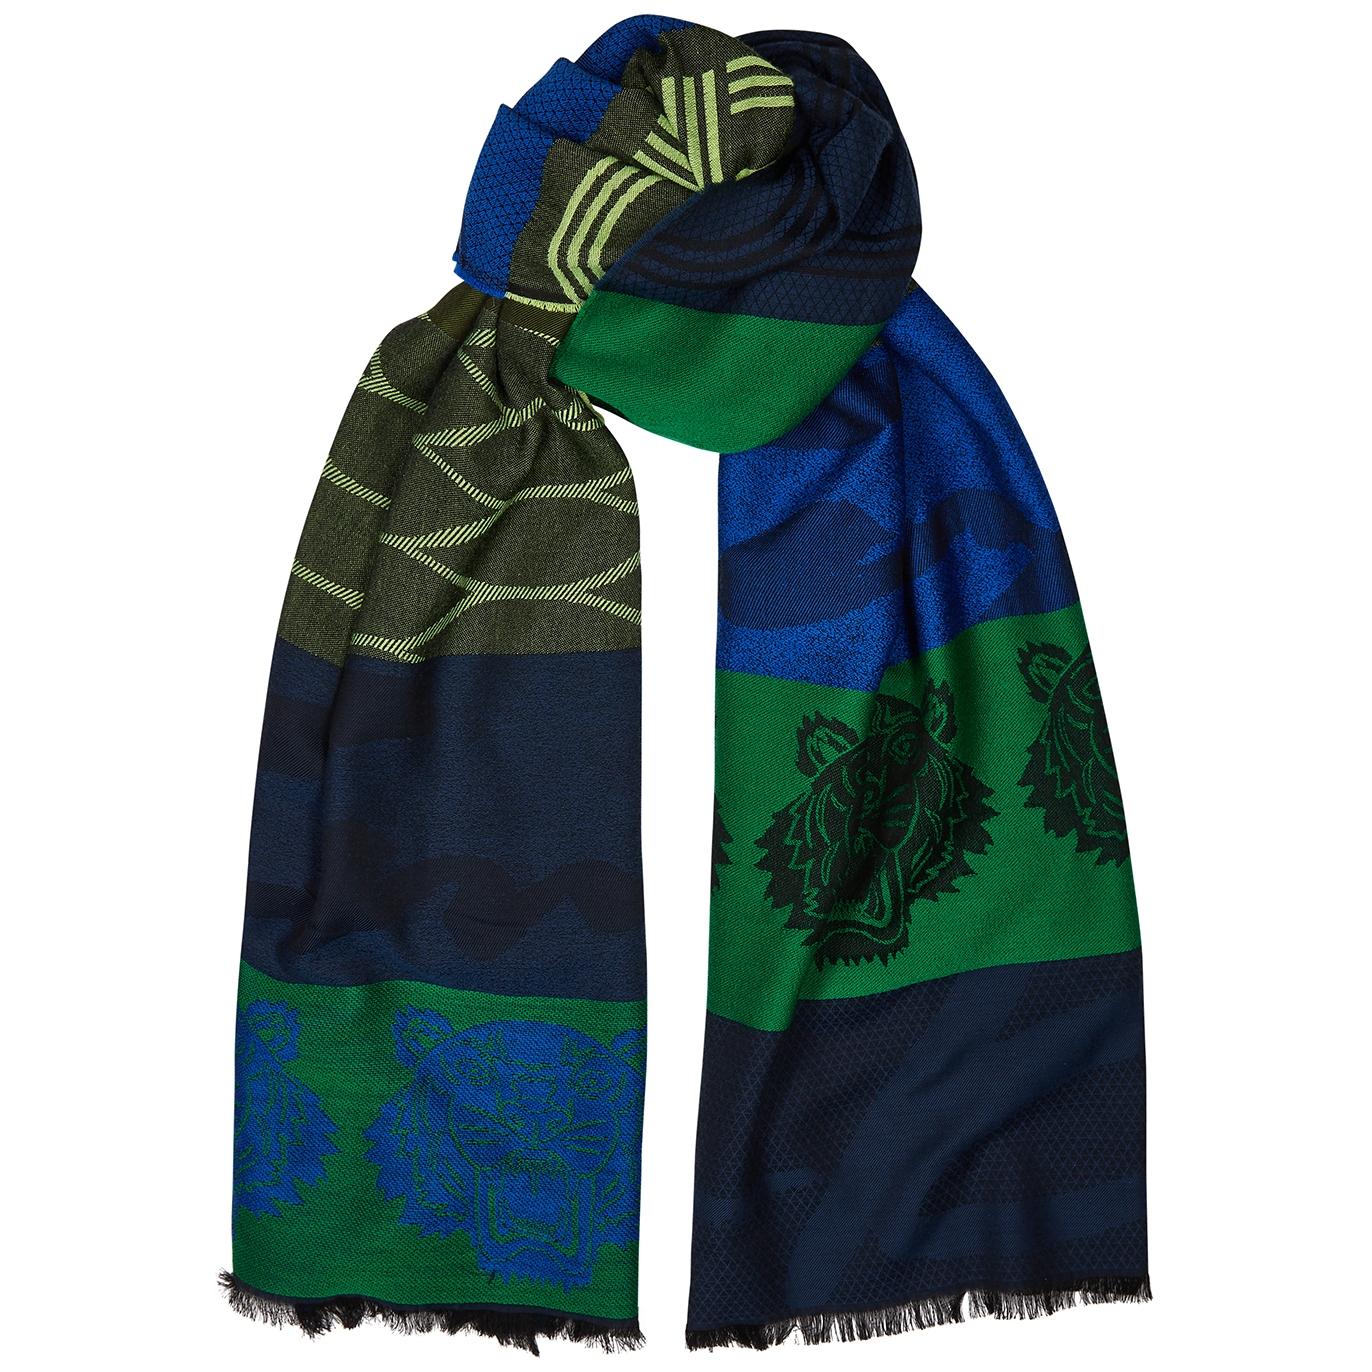 dd7d1c7edb Green and blue tiger-jacquard scarf